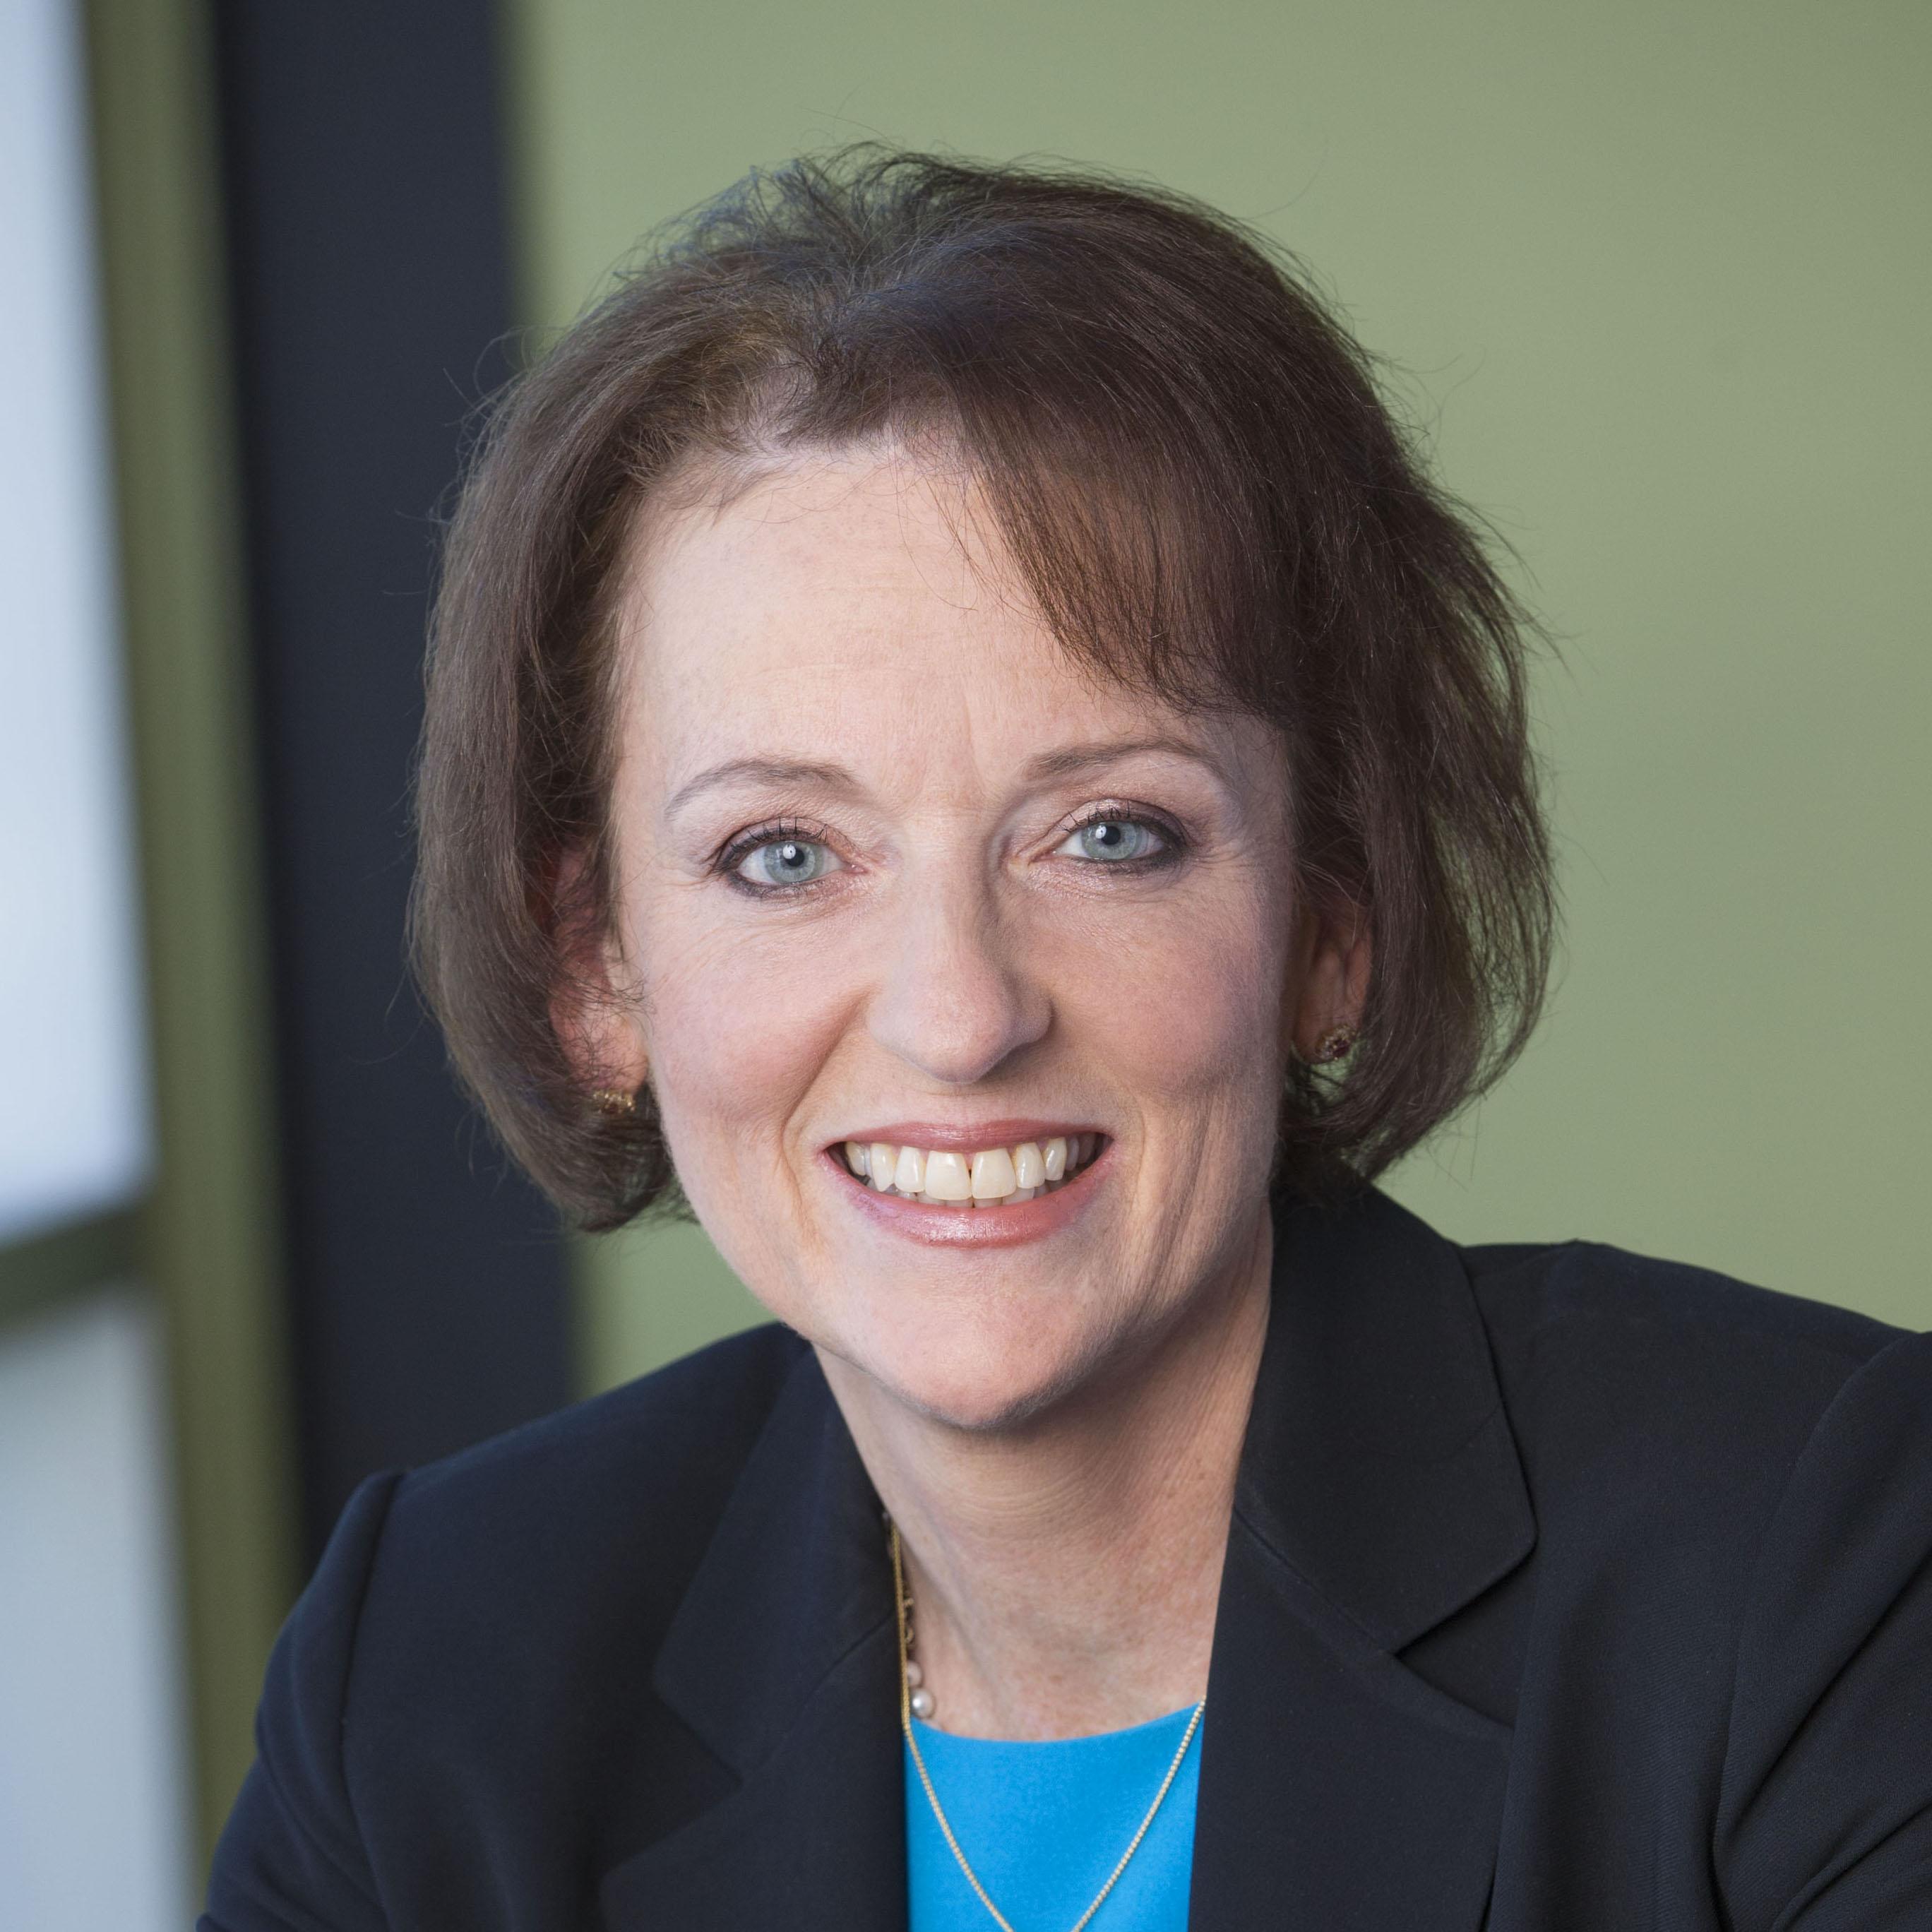 Barbara J. Burger